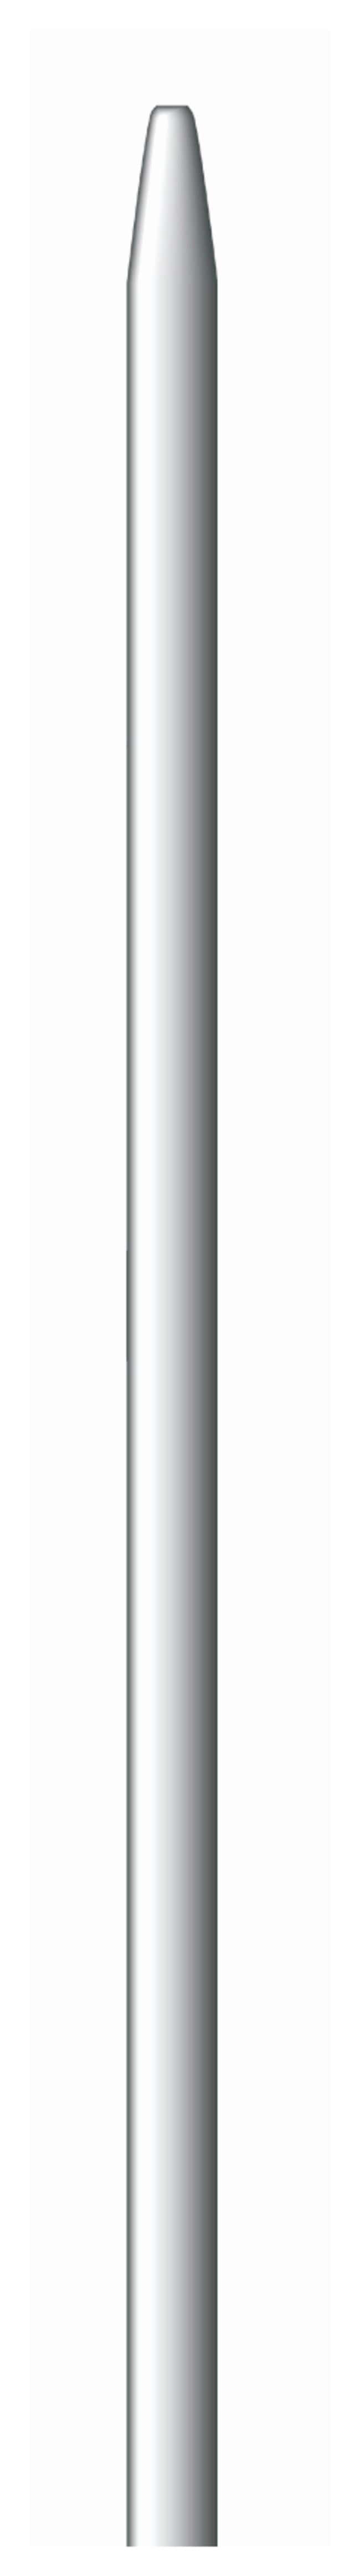 Trajan™Autosampler Syringes w/Repeating adaptor; 1μL; 23 Gauge; 70mm L; O.D.: 0.63mm Trajan™Autosampler Syringes